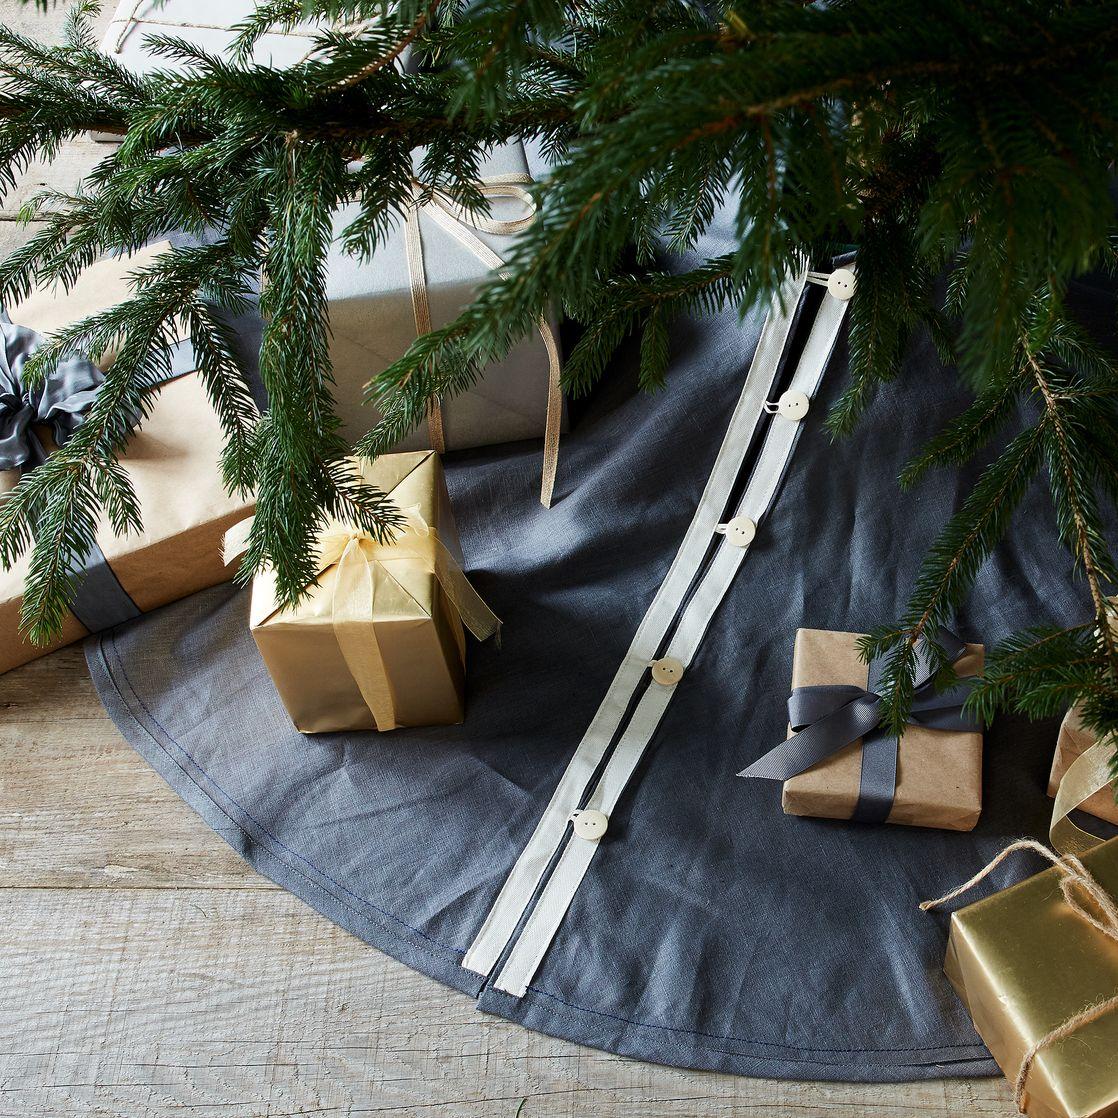 10 Best Christmas Tree Skirts for 2017 - Festive Wicker ...